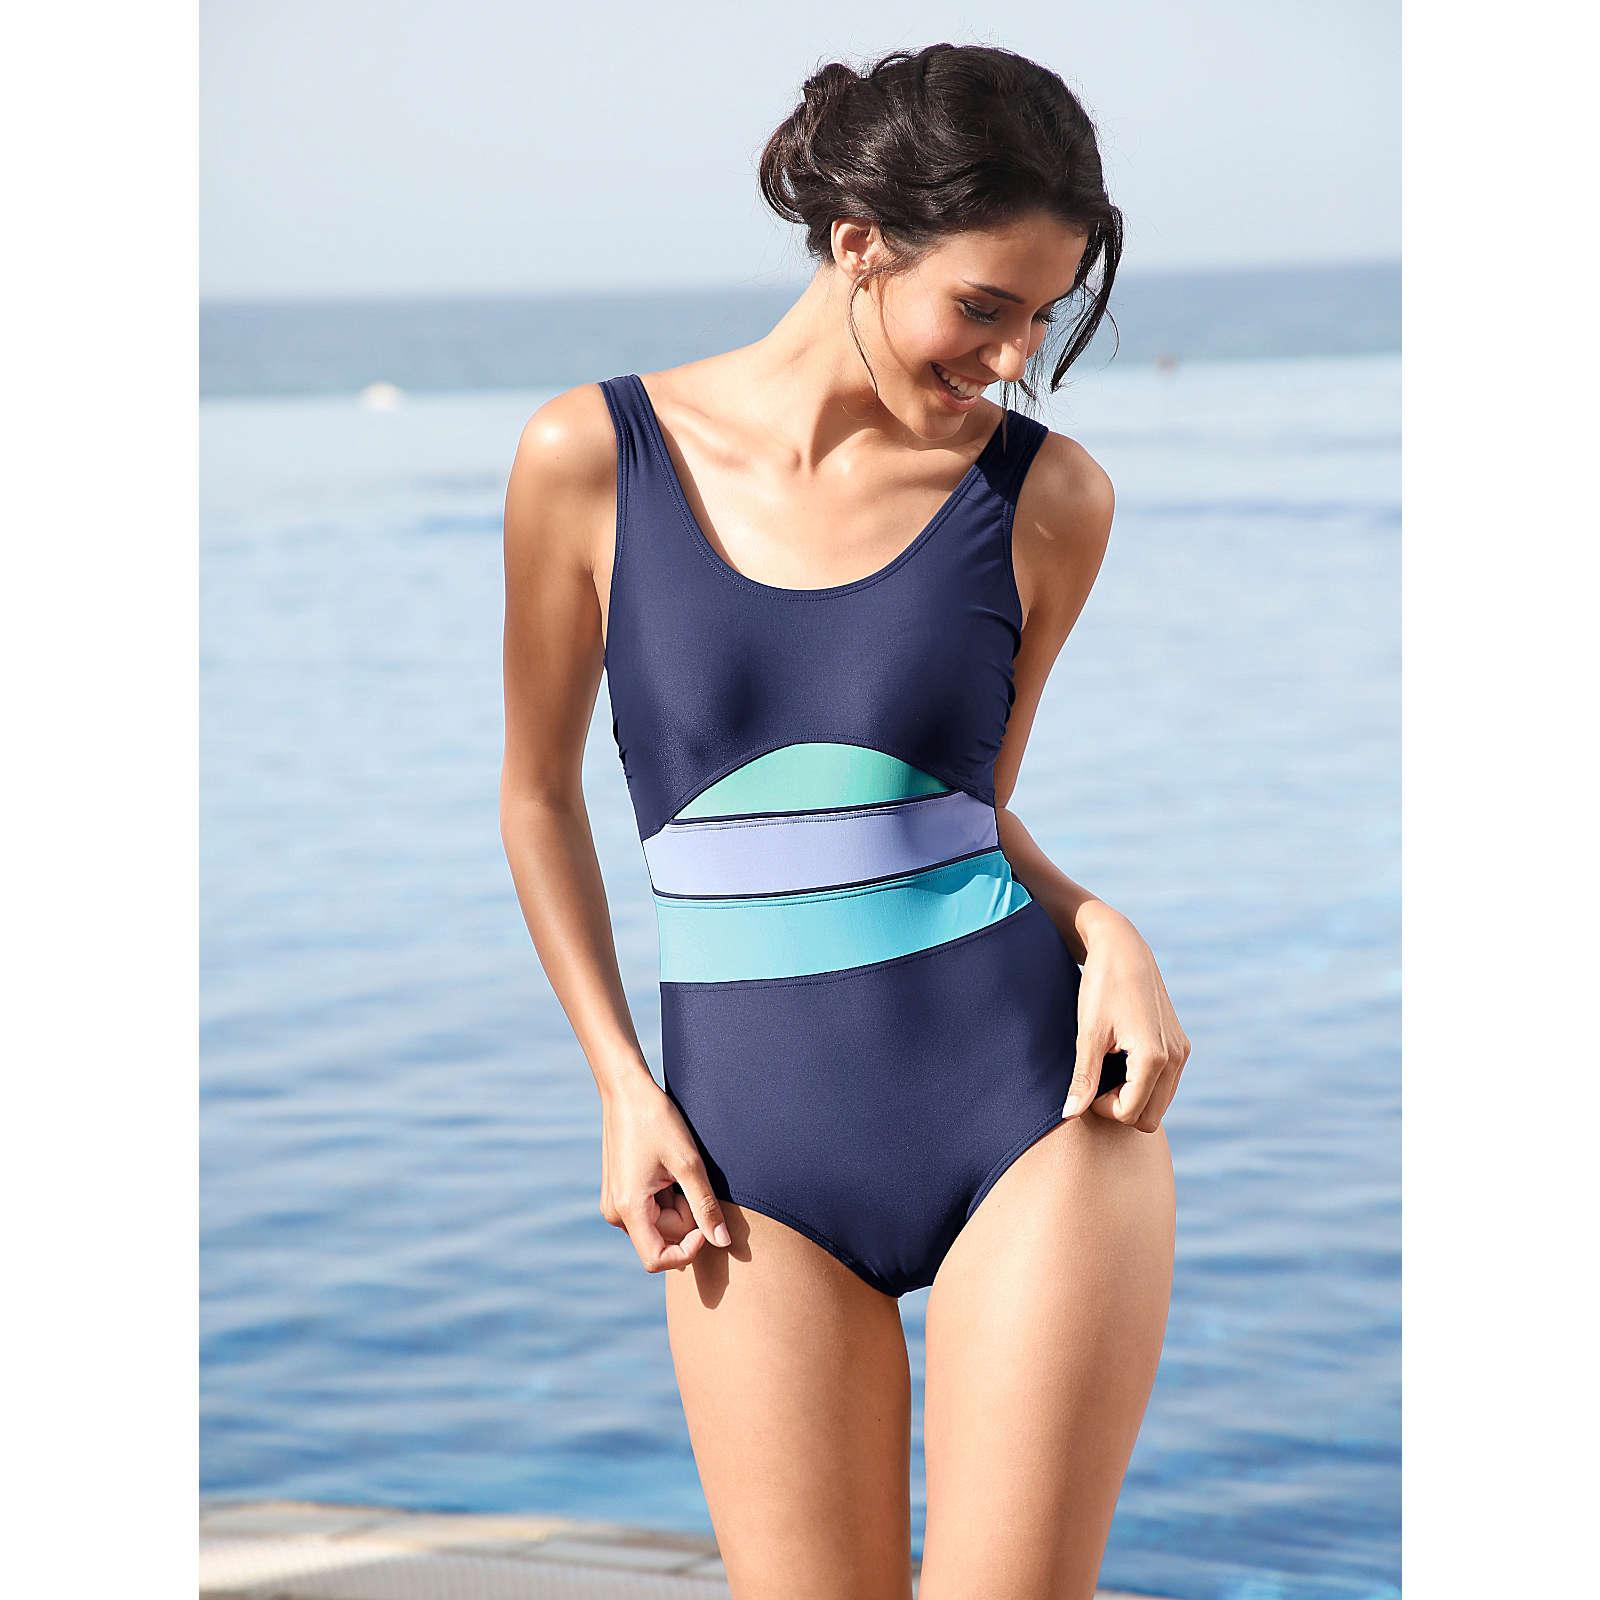 Maritim Badeanzug dunkelblau Damen Gr. 40